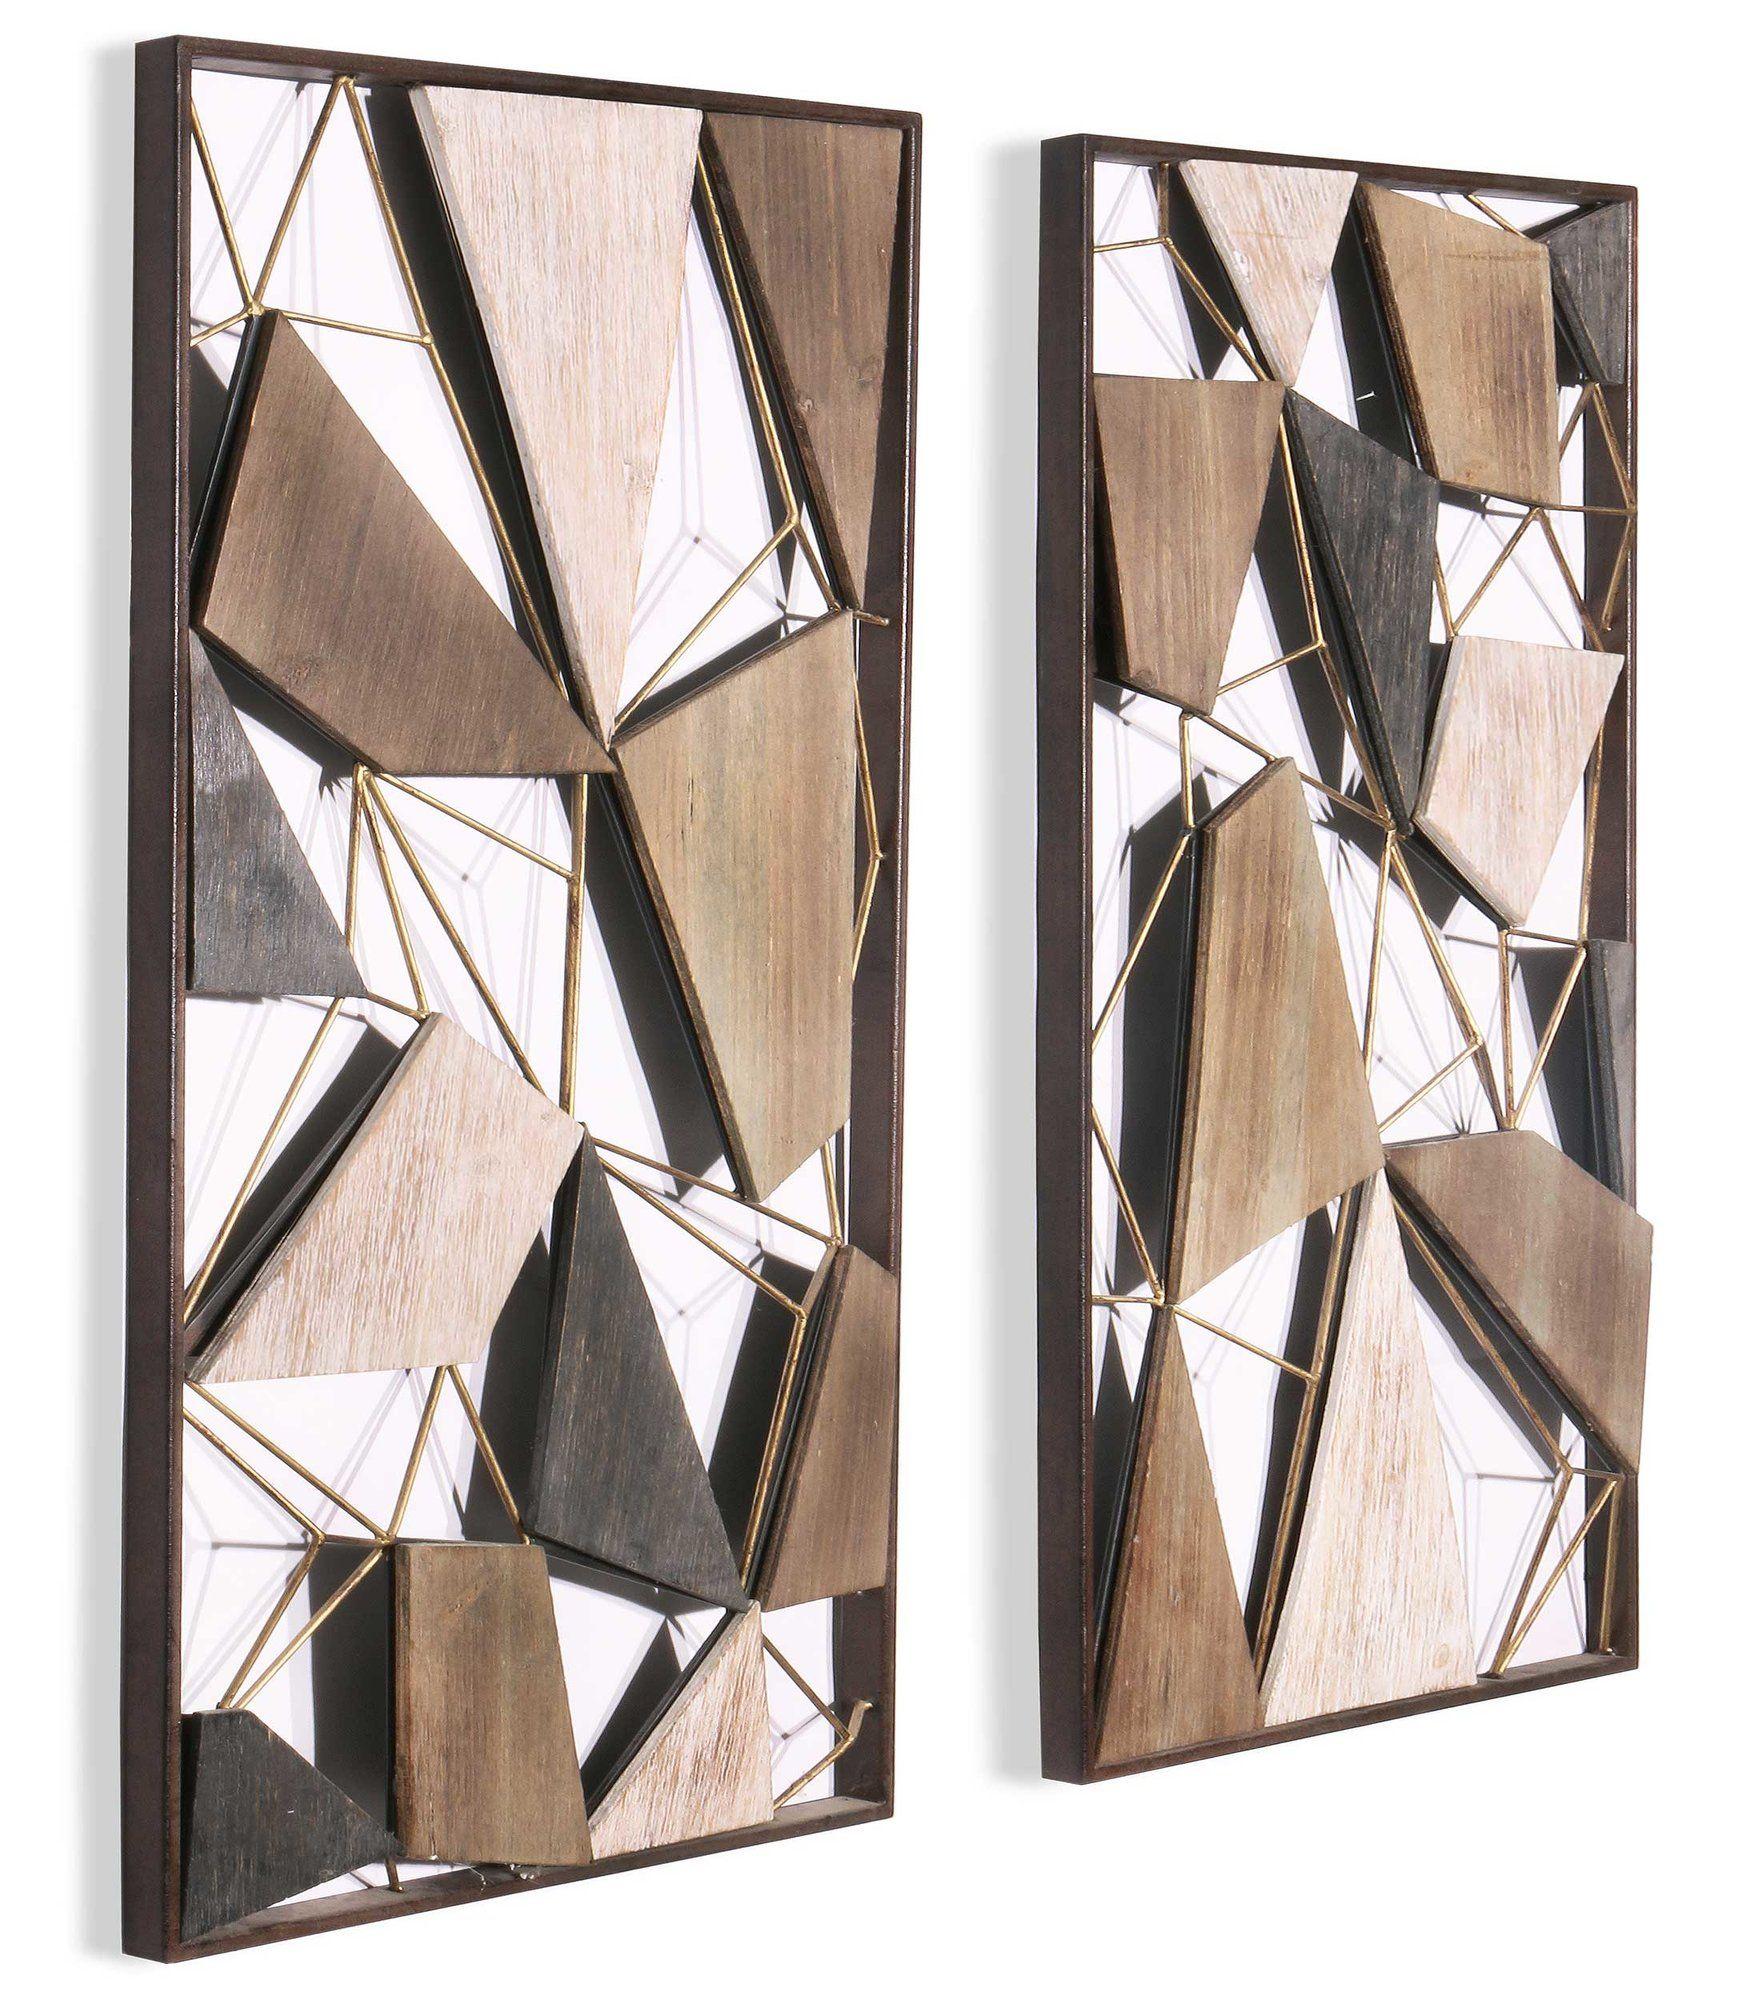 2 piece geometric wood and metal wall decor set